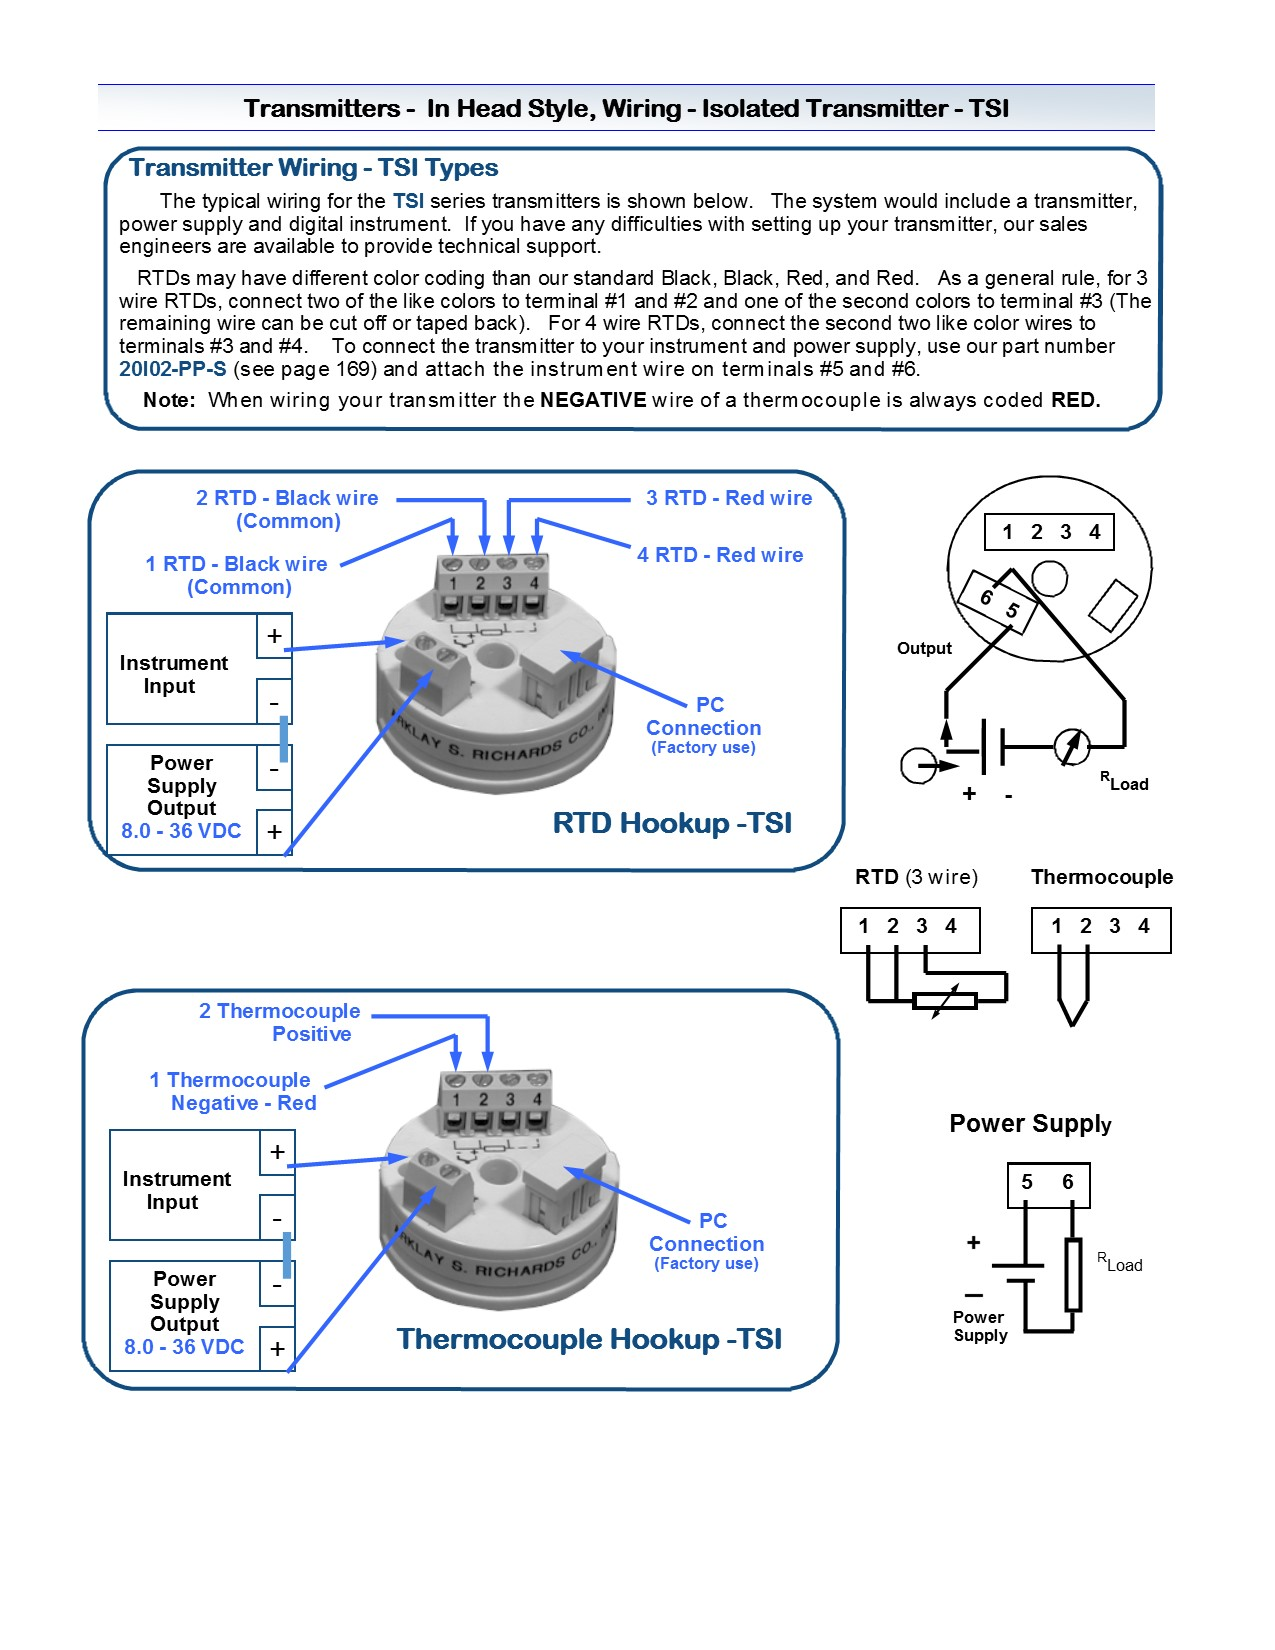 p171 Transmitters Pub 20171102-3